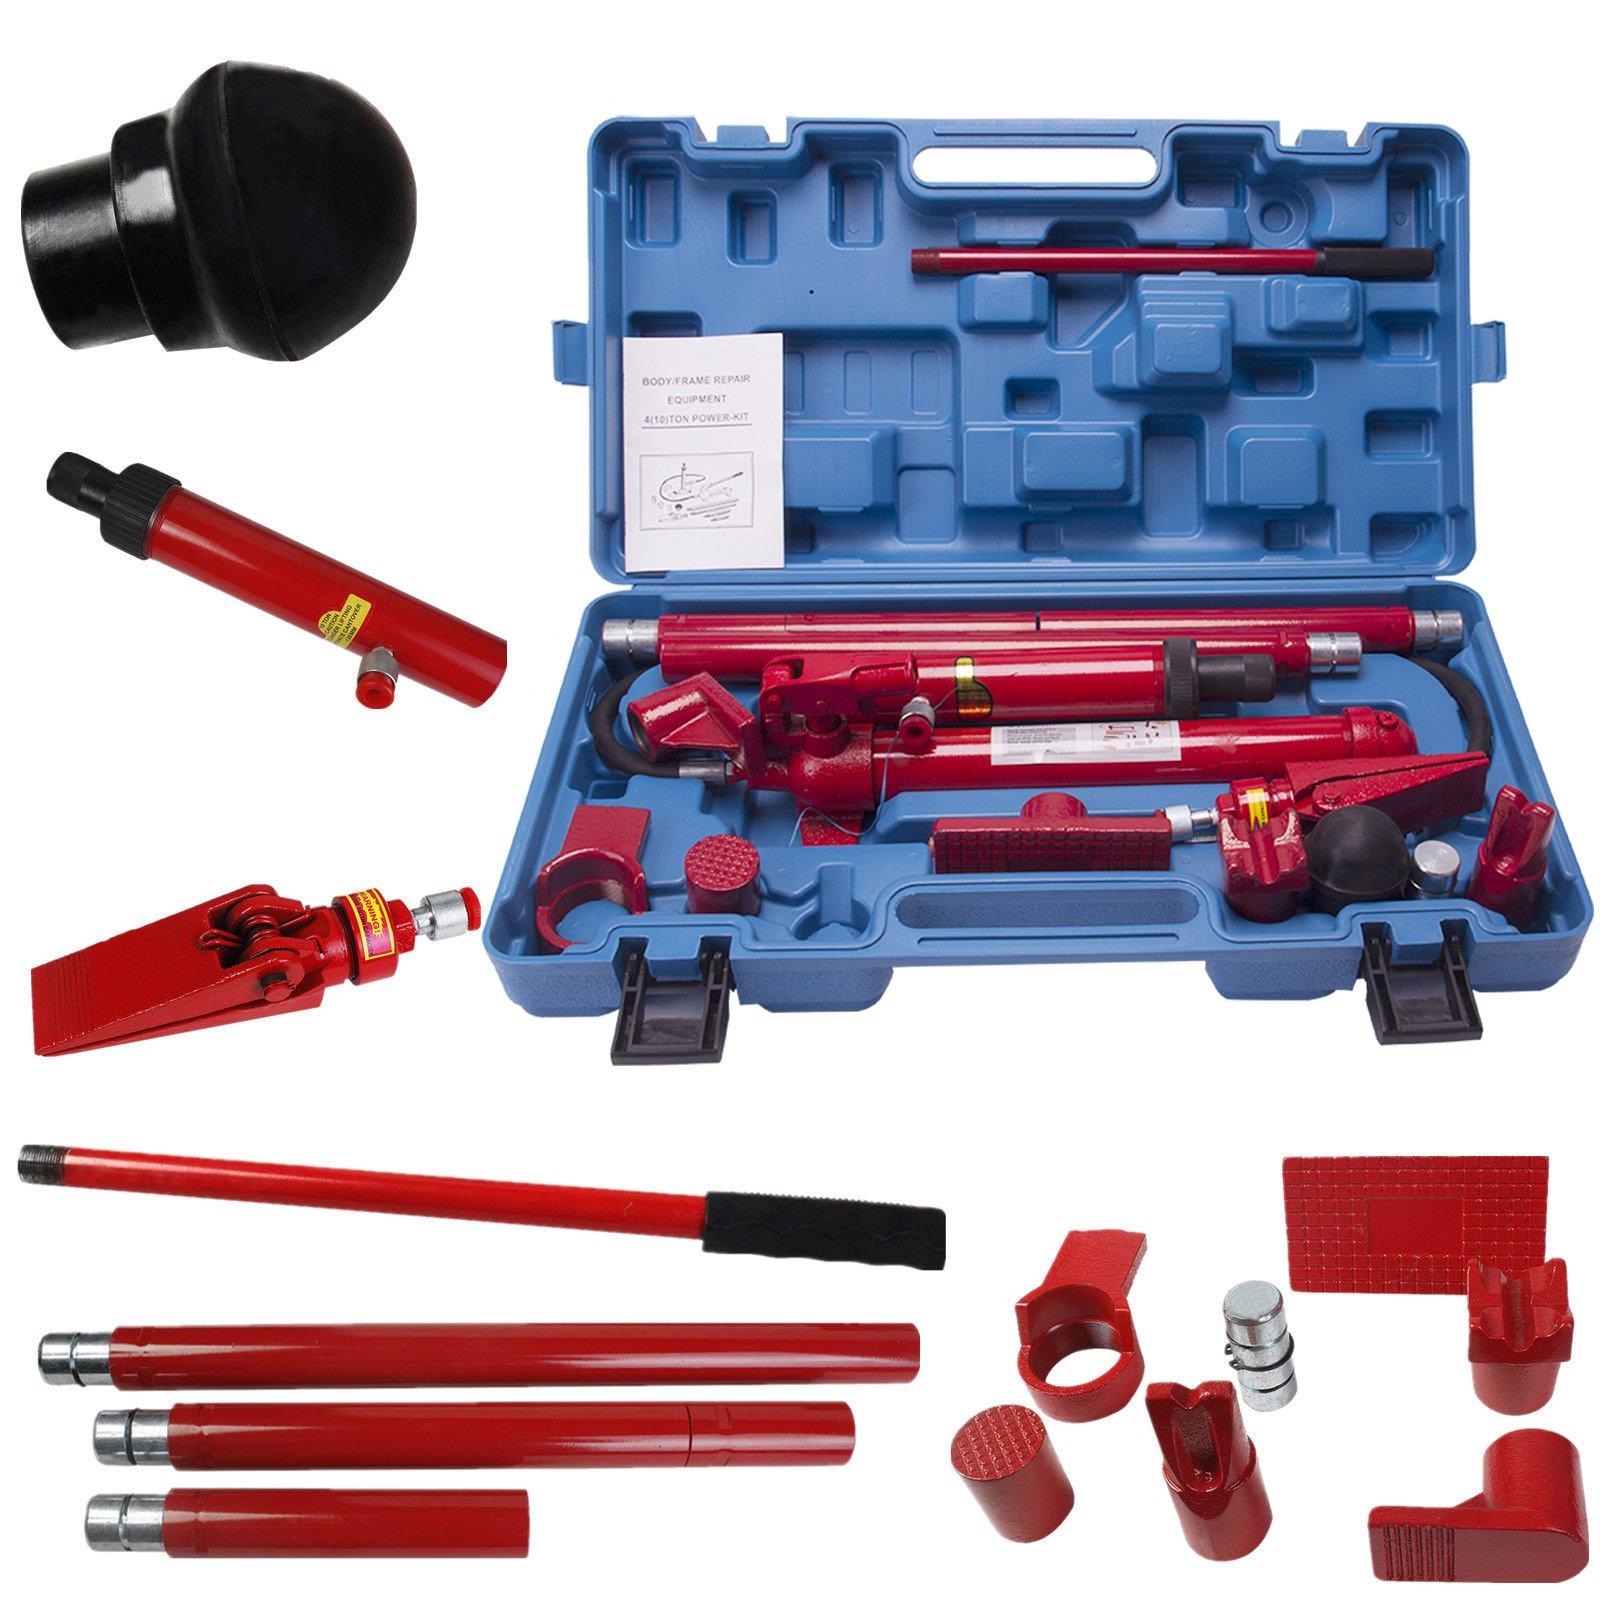 Comie 10 Ton Porta Power Hydraulic Jack Air Pump Lift Ram Body Frame Repair Kit Auto Shop Tool Heavy Set